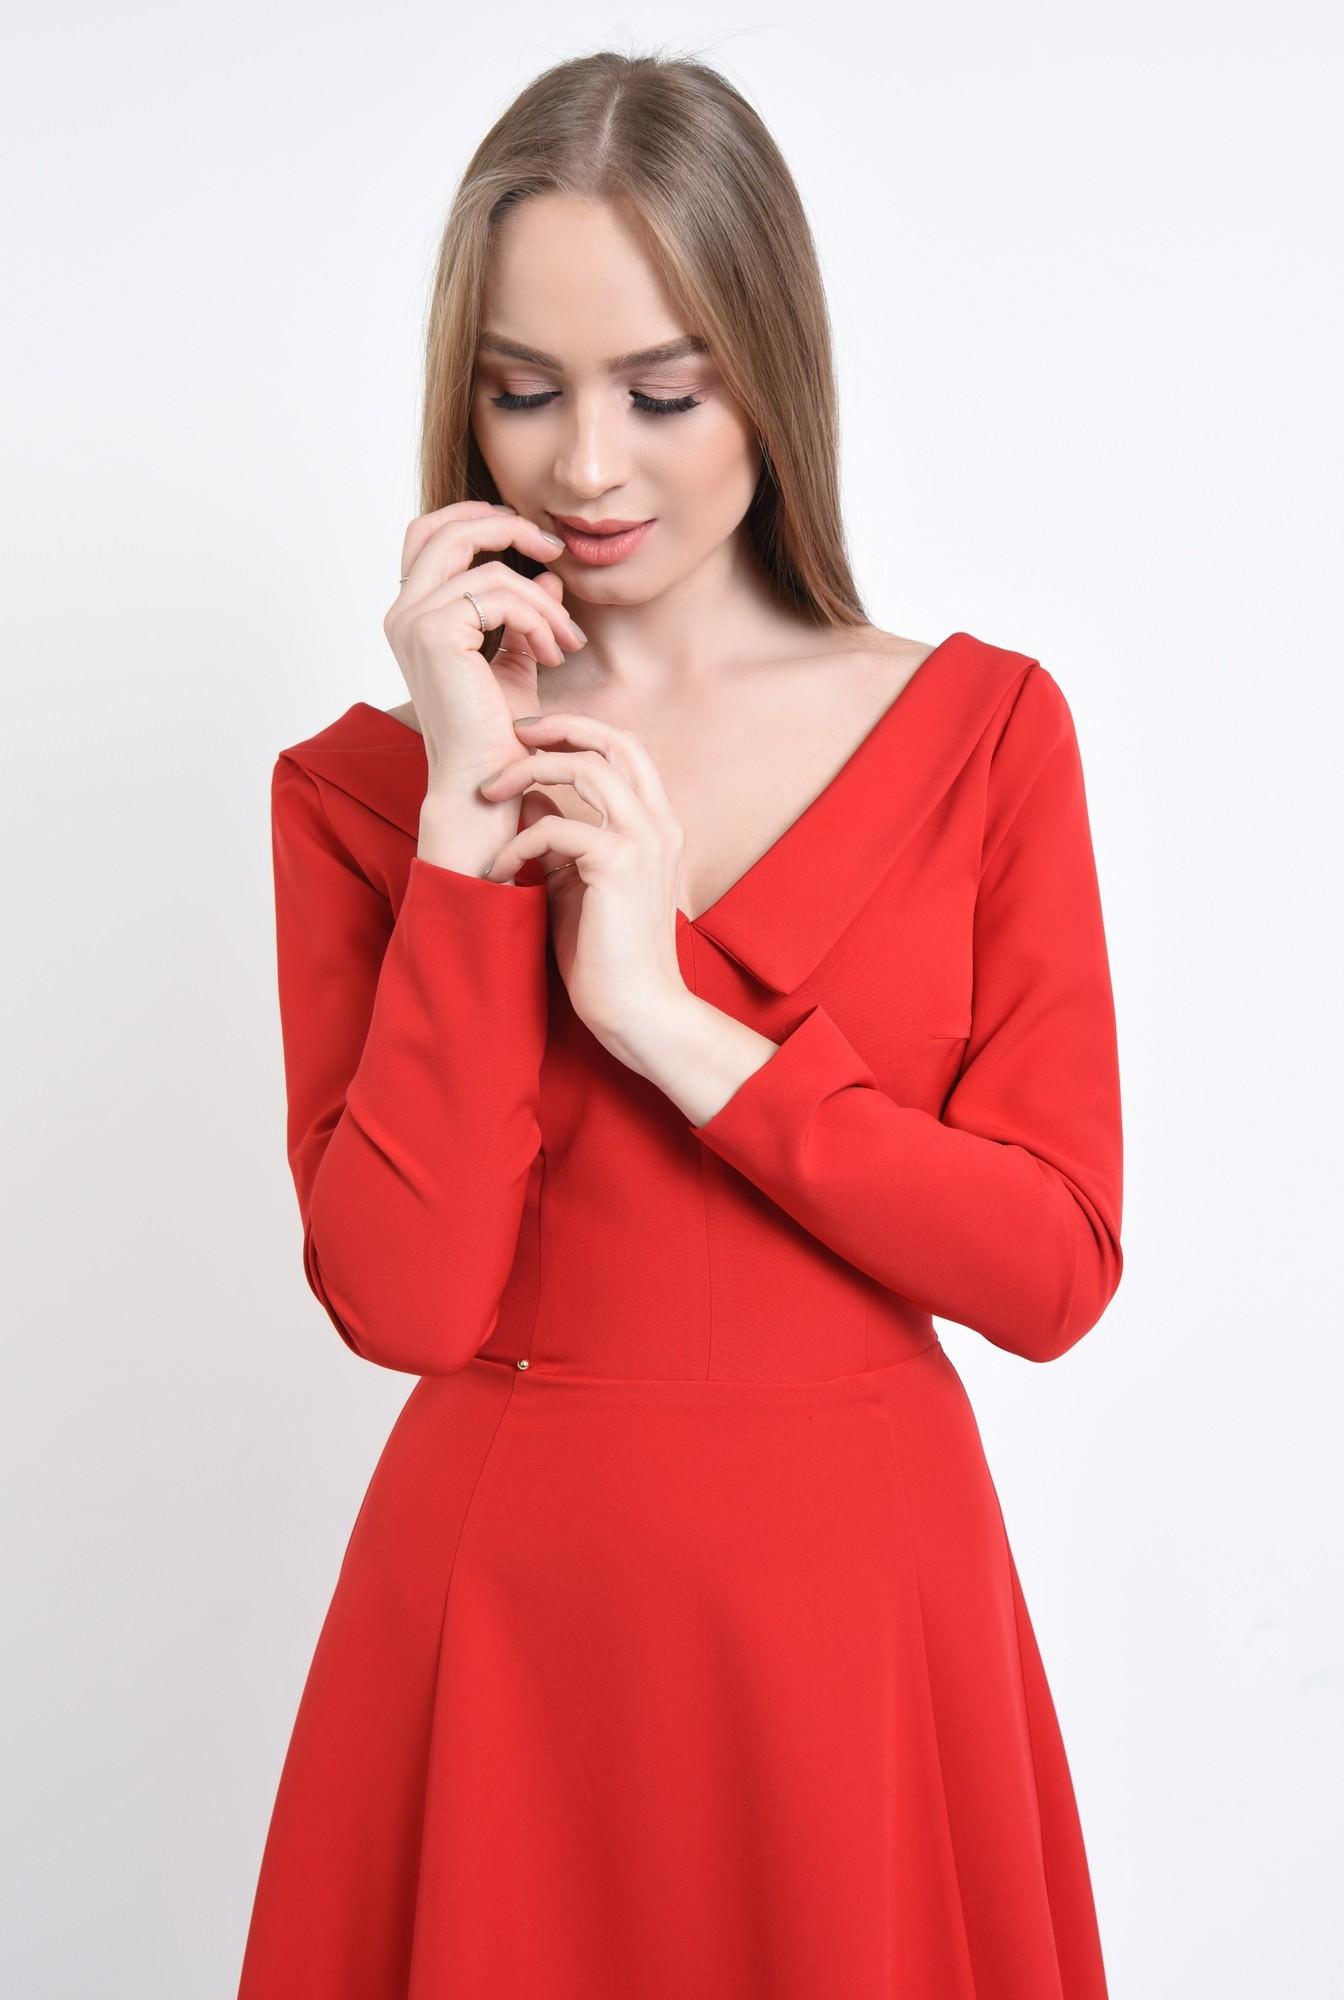 2 - Rochie de zi rosie, cloche